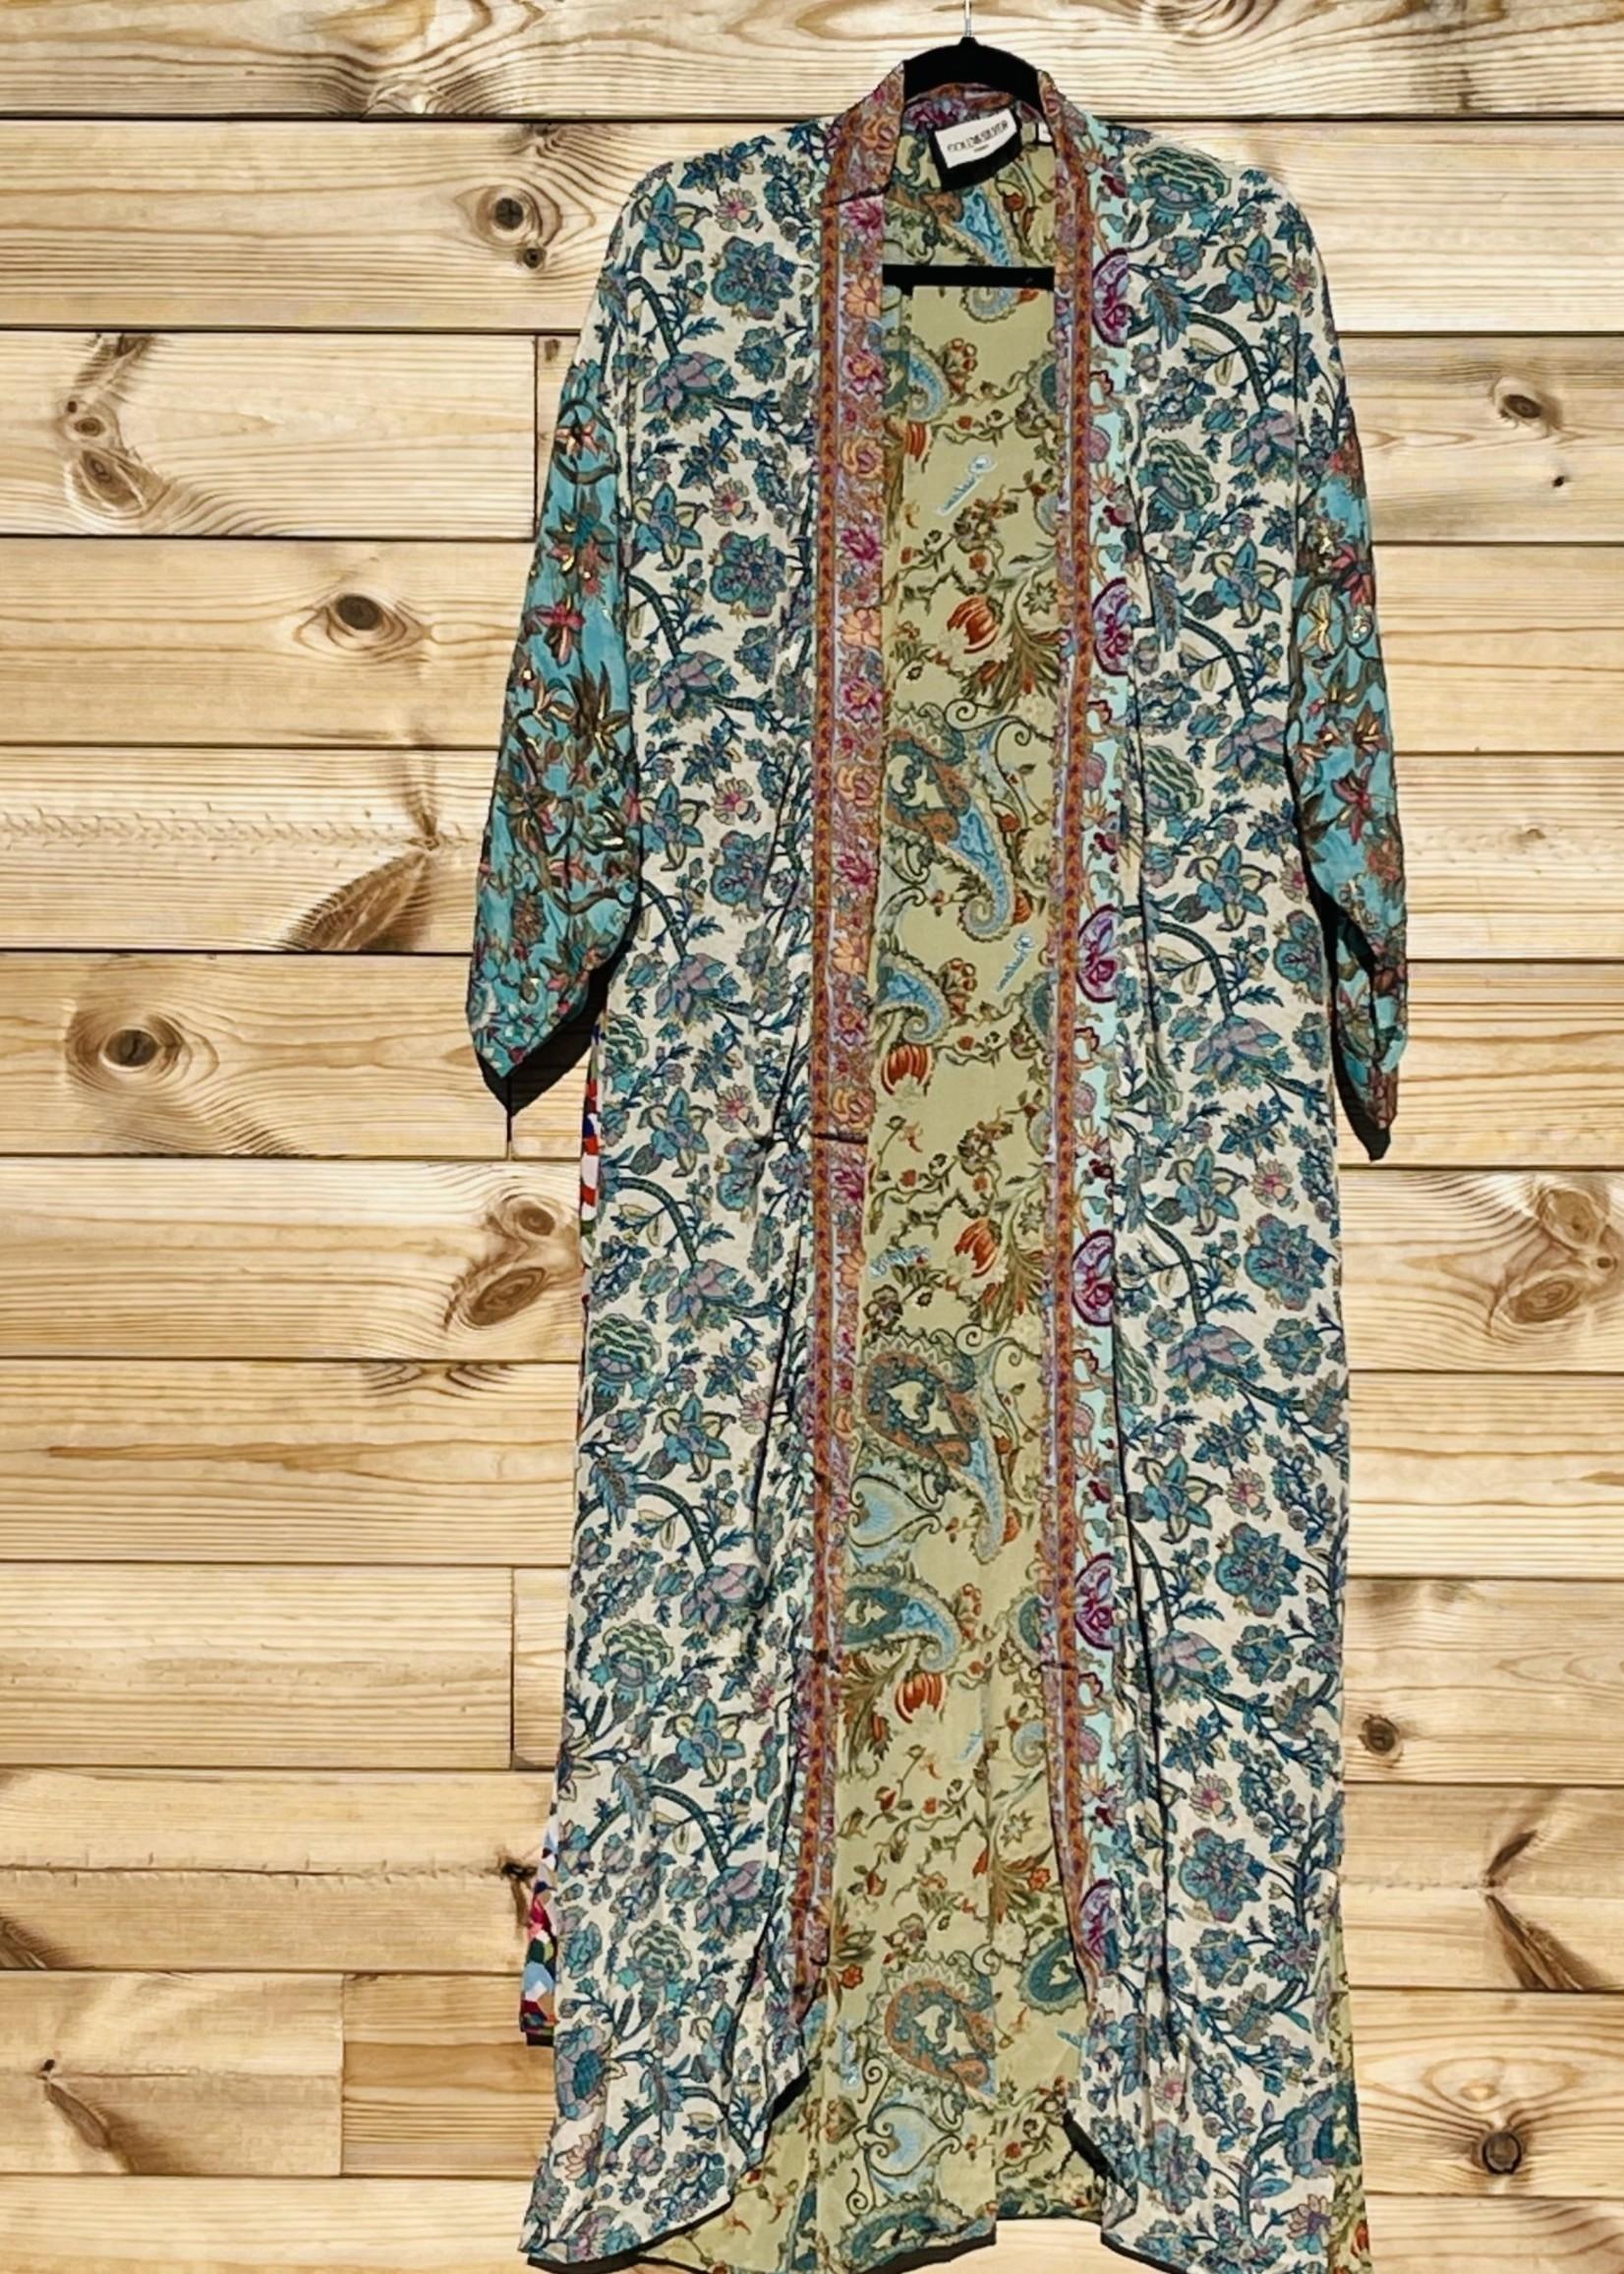 Guts & Goats Kimono Long 100